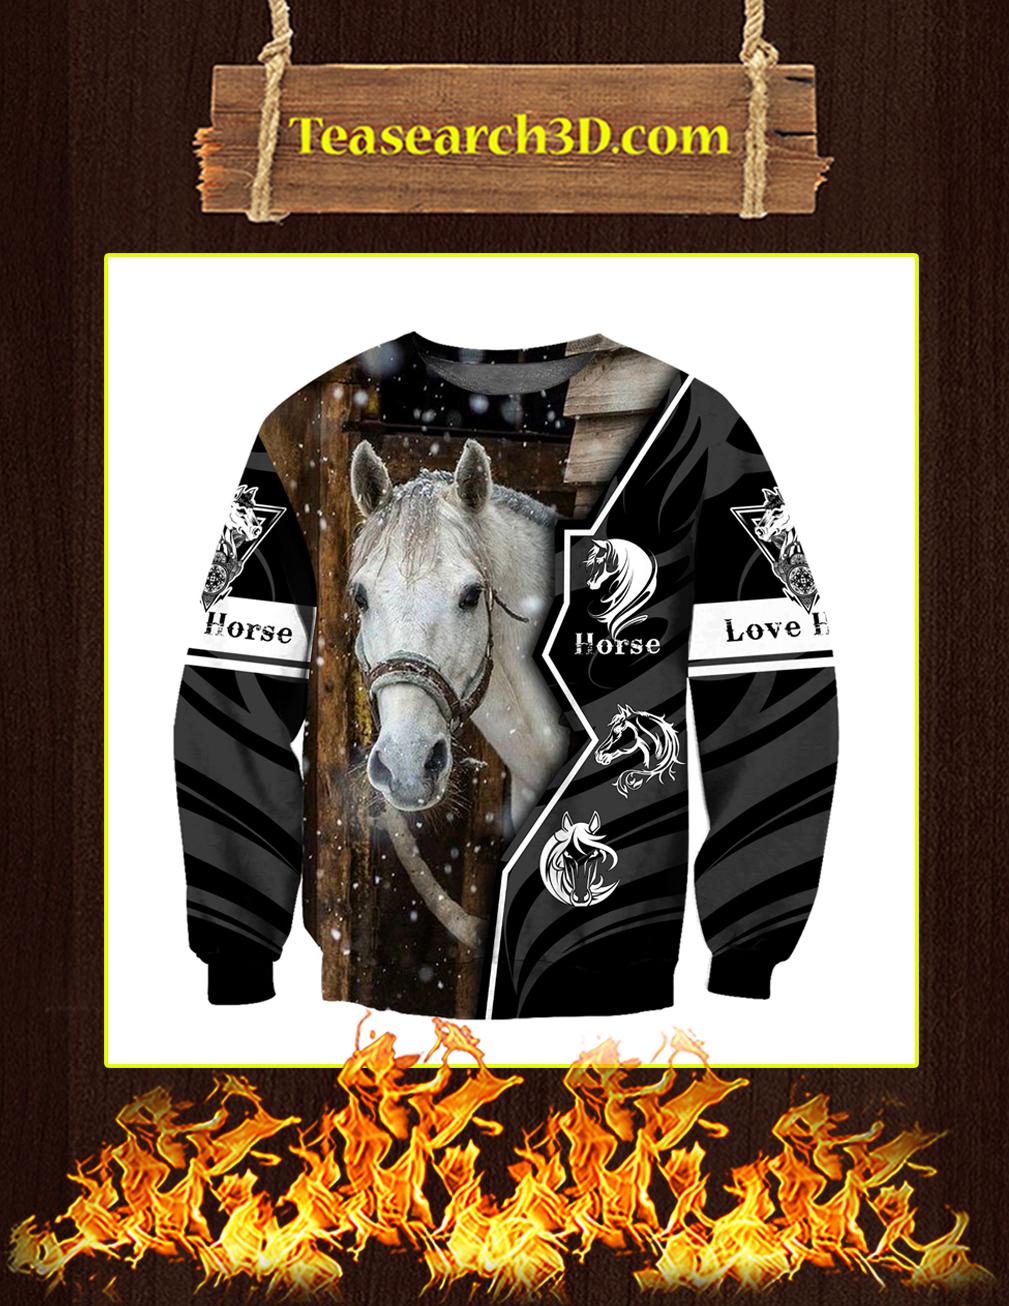 Beautiful Love Horse 3D All Over Printed Sweatshirt